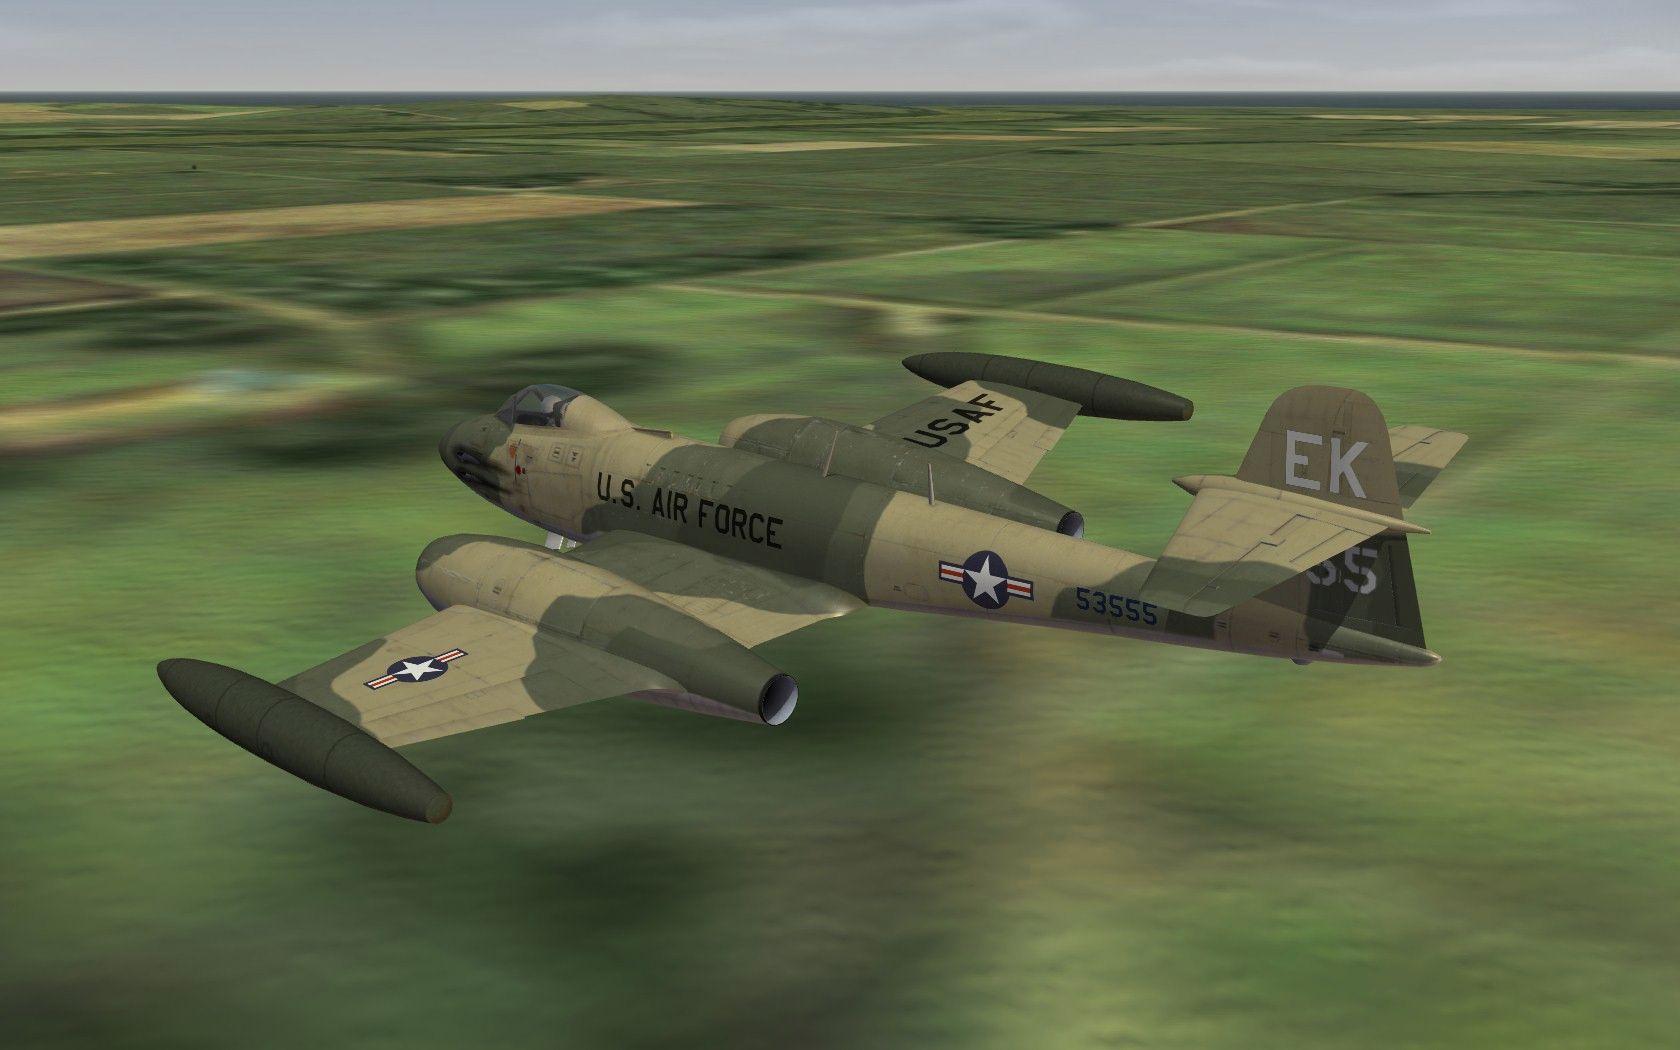 USAFF-73DREAPER05.jpg